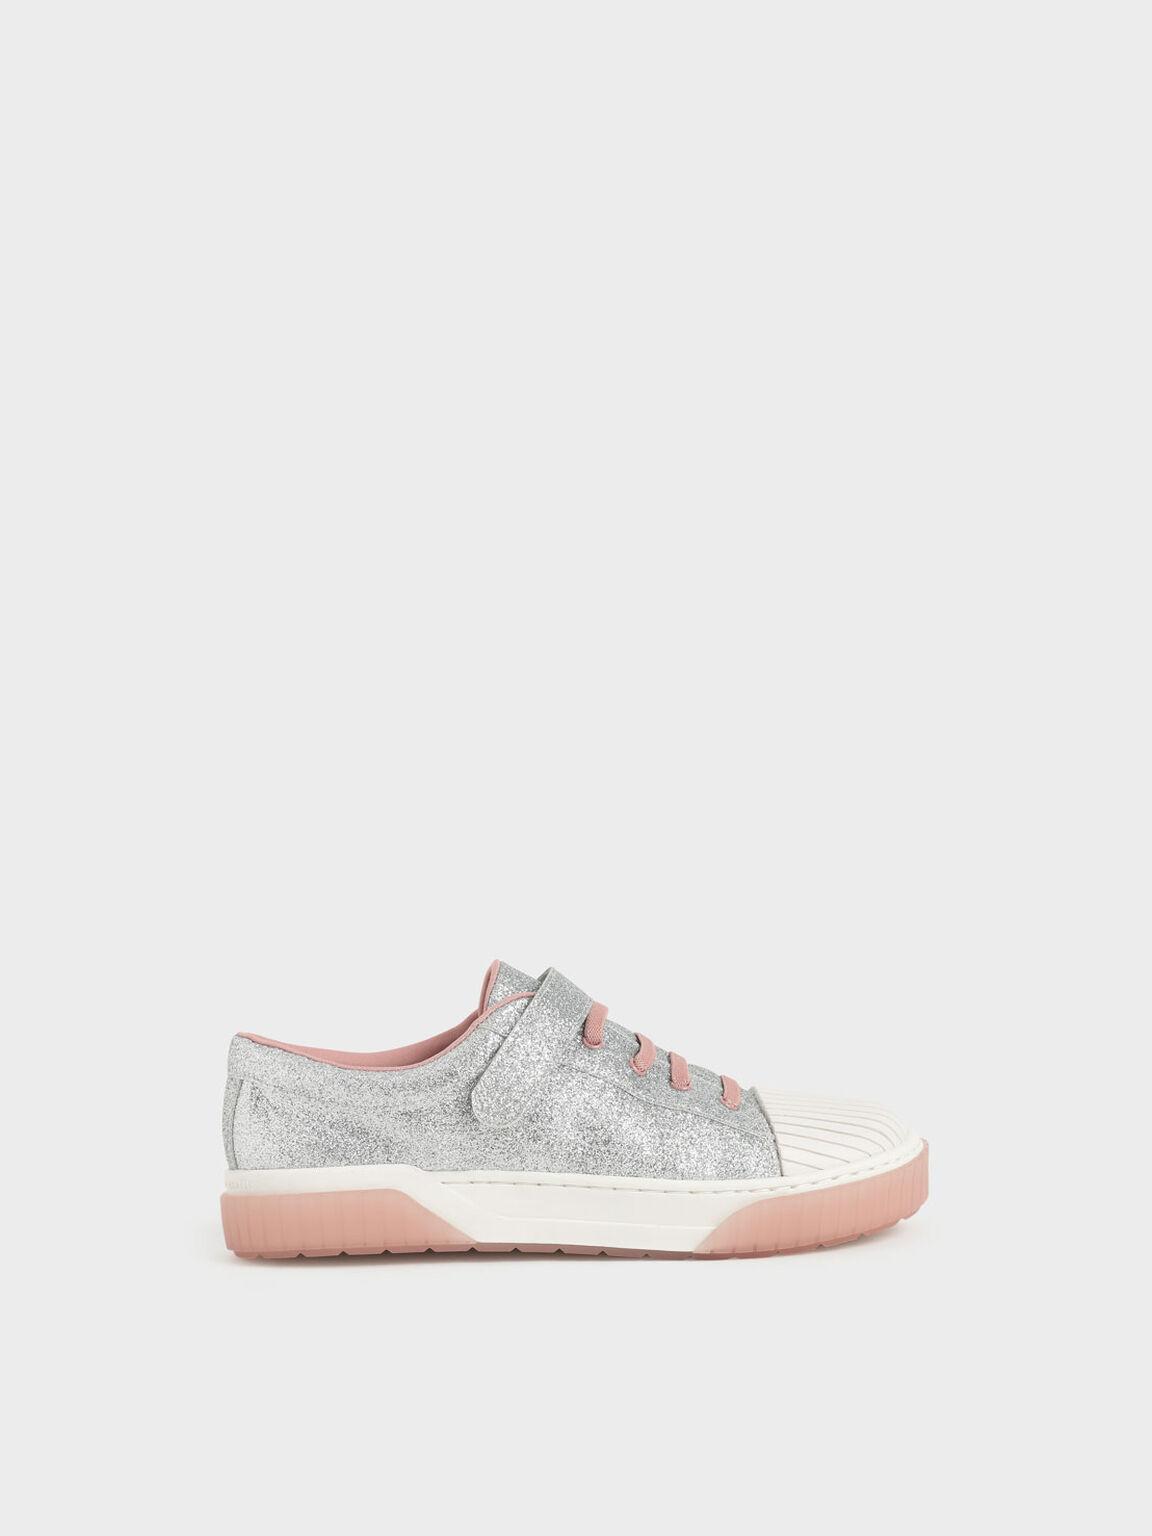 Girls' Glitter Platform Sneakers, Silver, hi-res